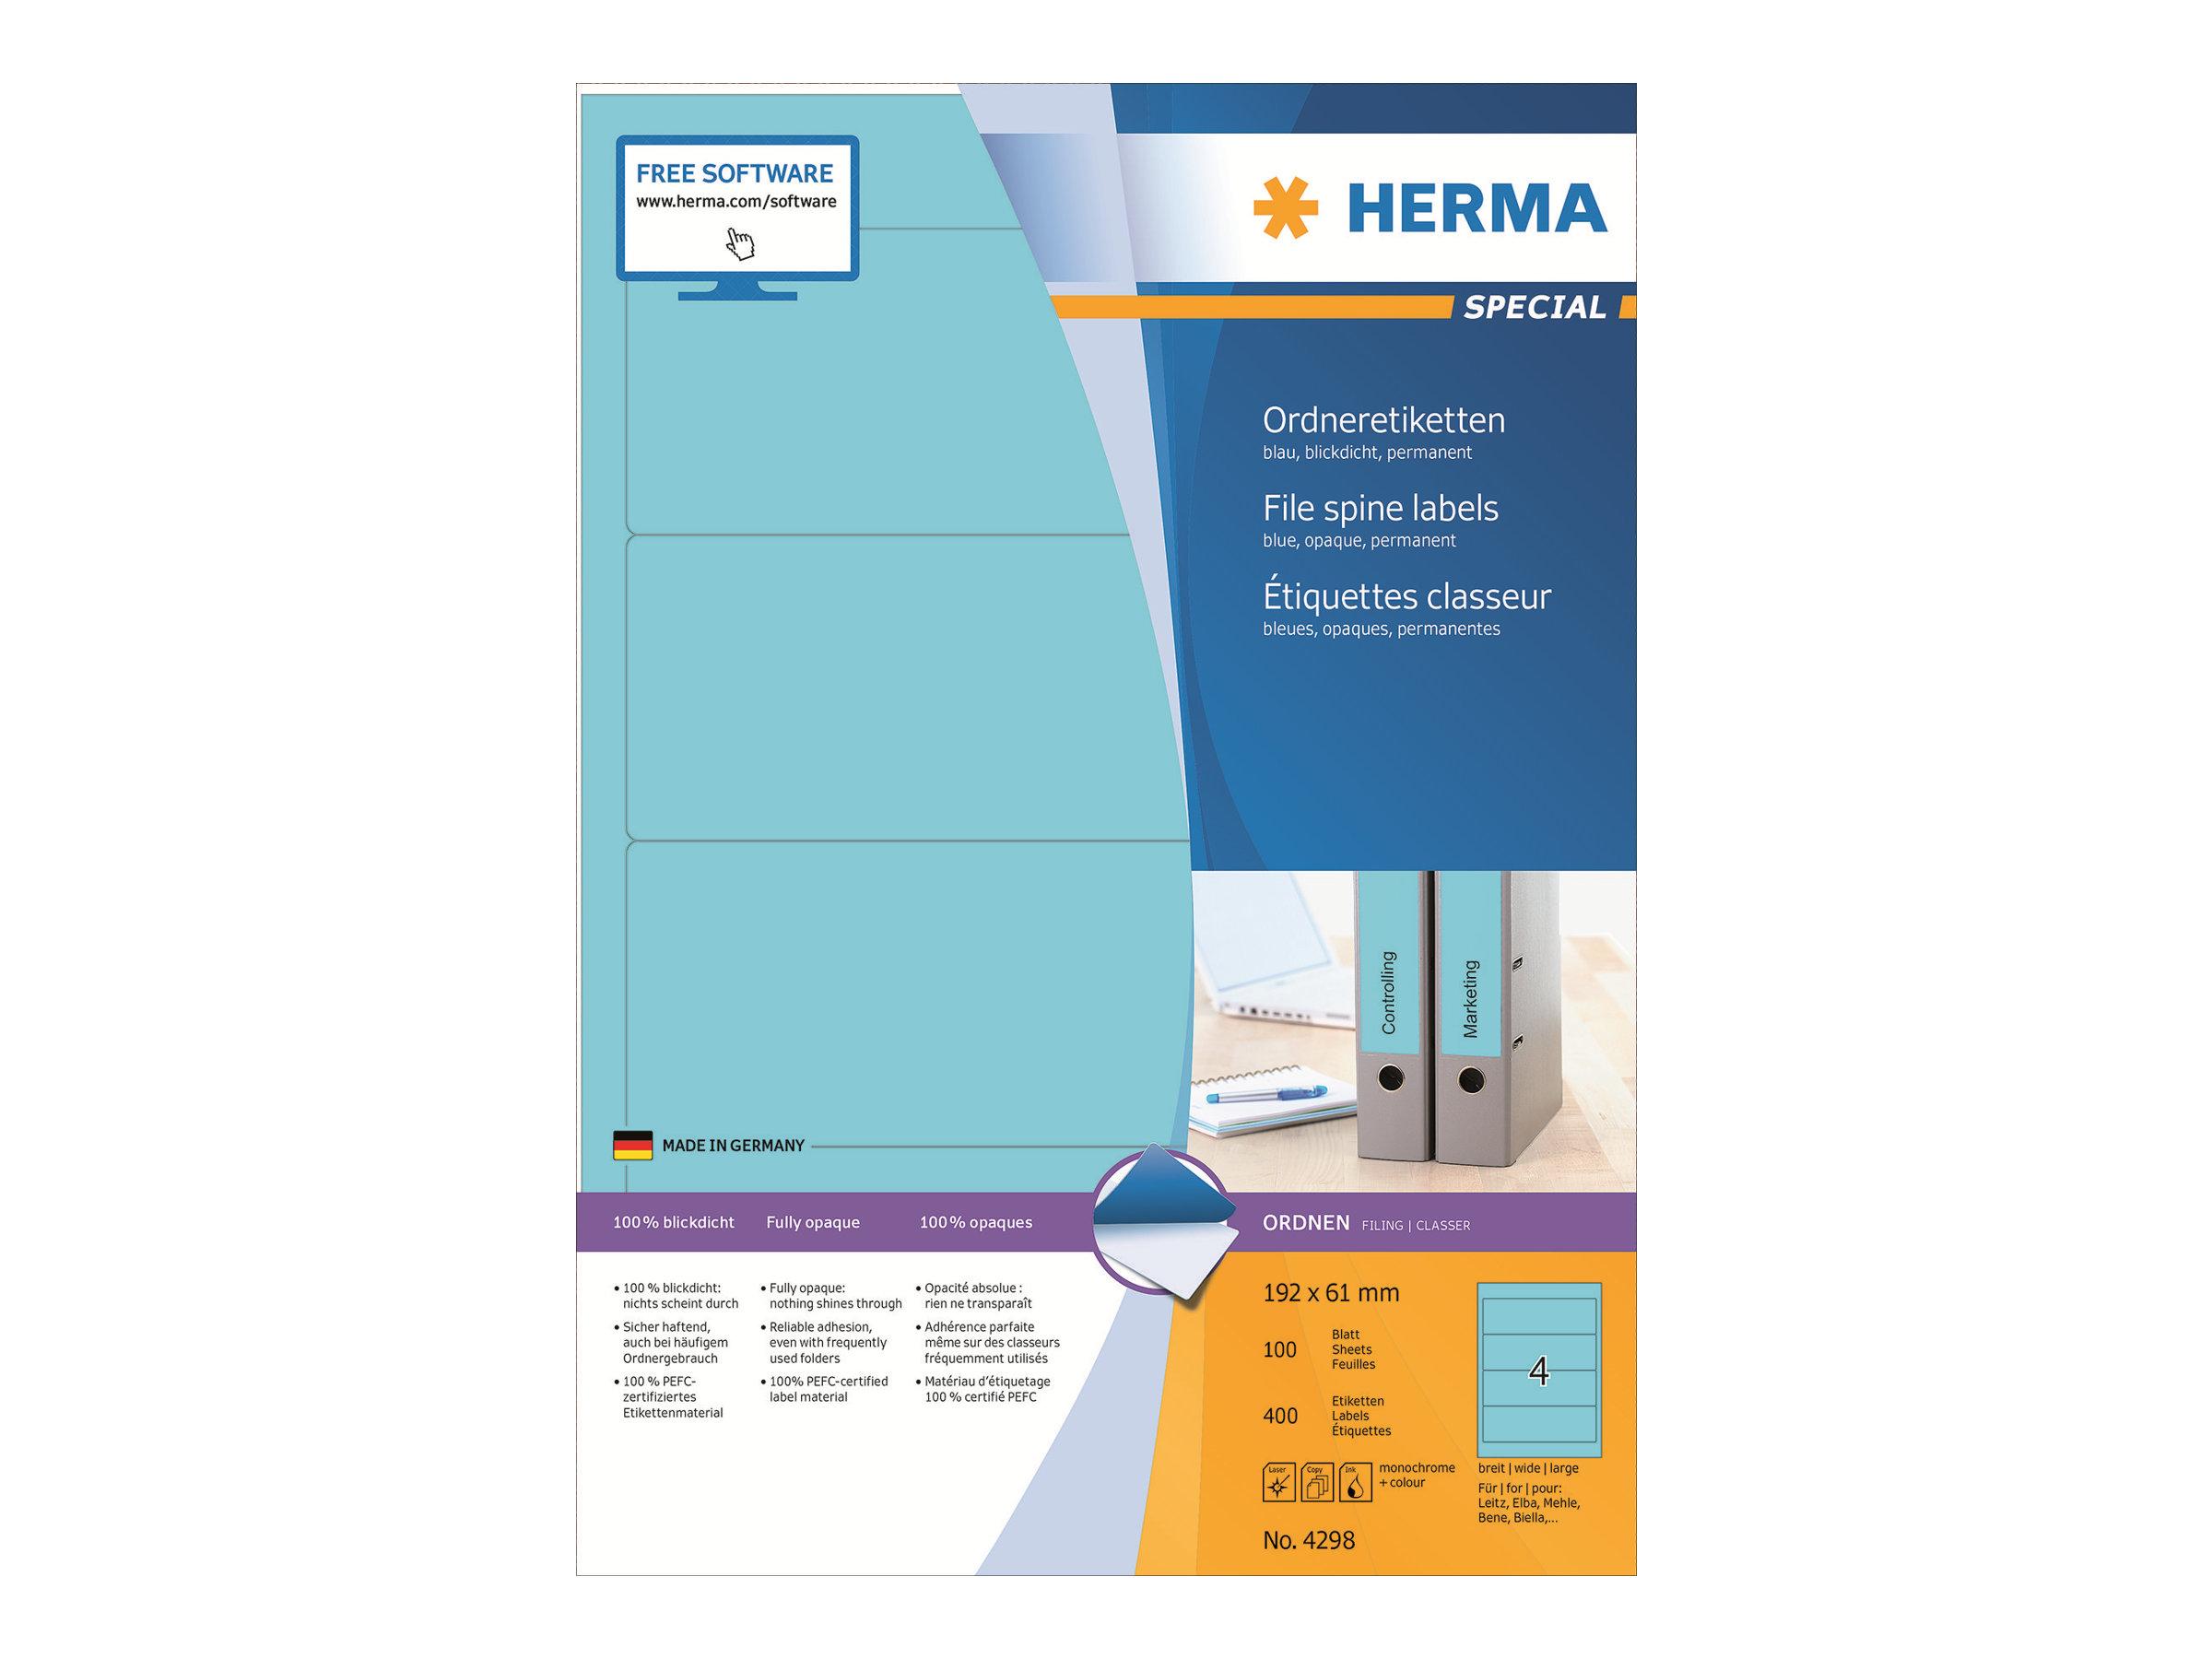 HERMA Special - Papier - matt - permanent selbstklebend - Blau - 192 x 61 mm 400 Etikett(en) (100 Bogen x 4)